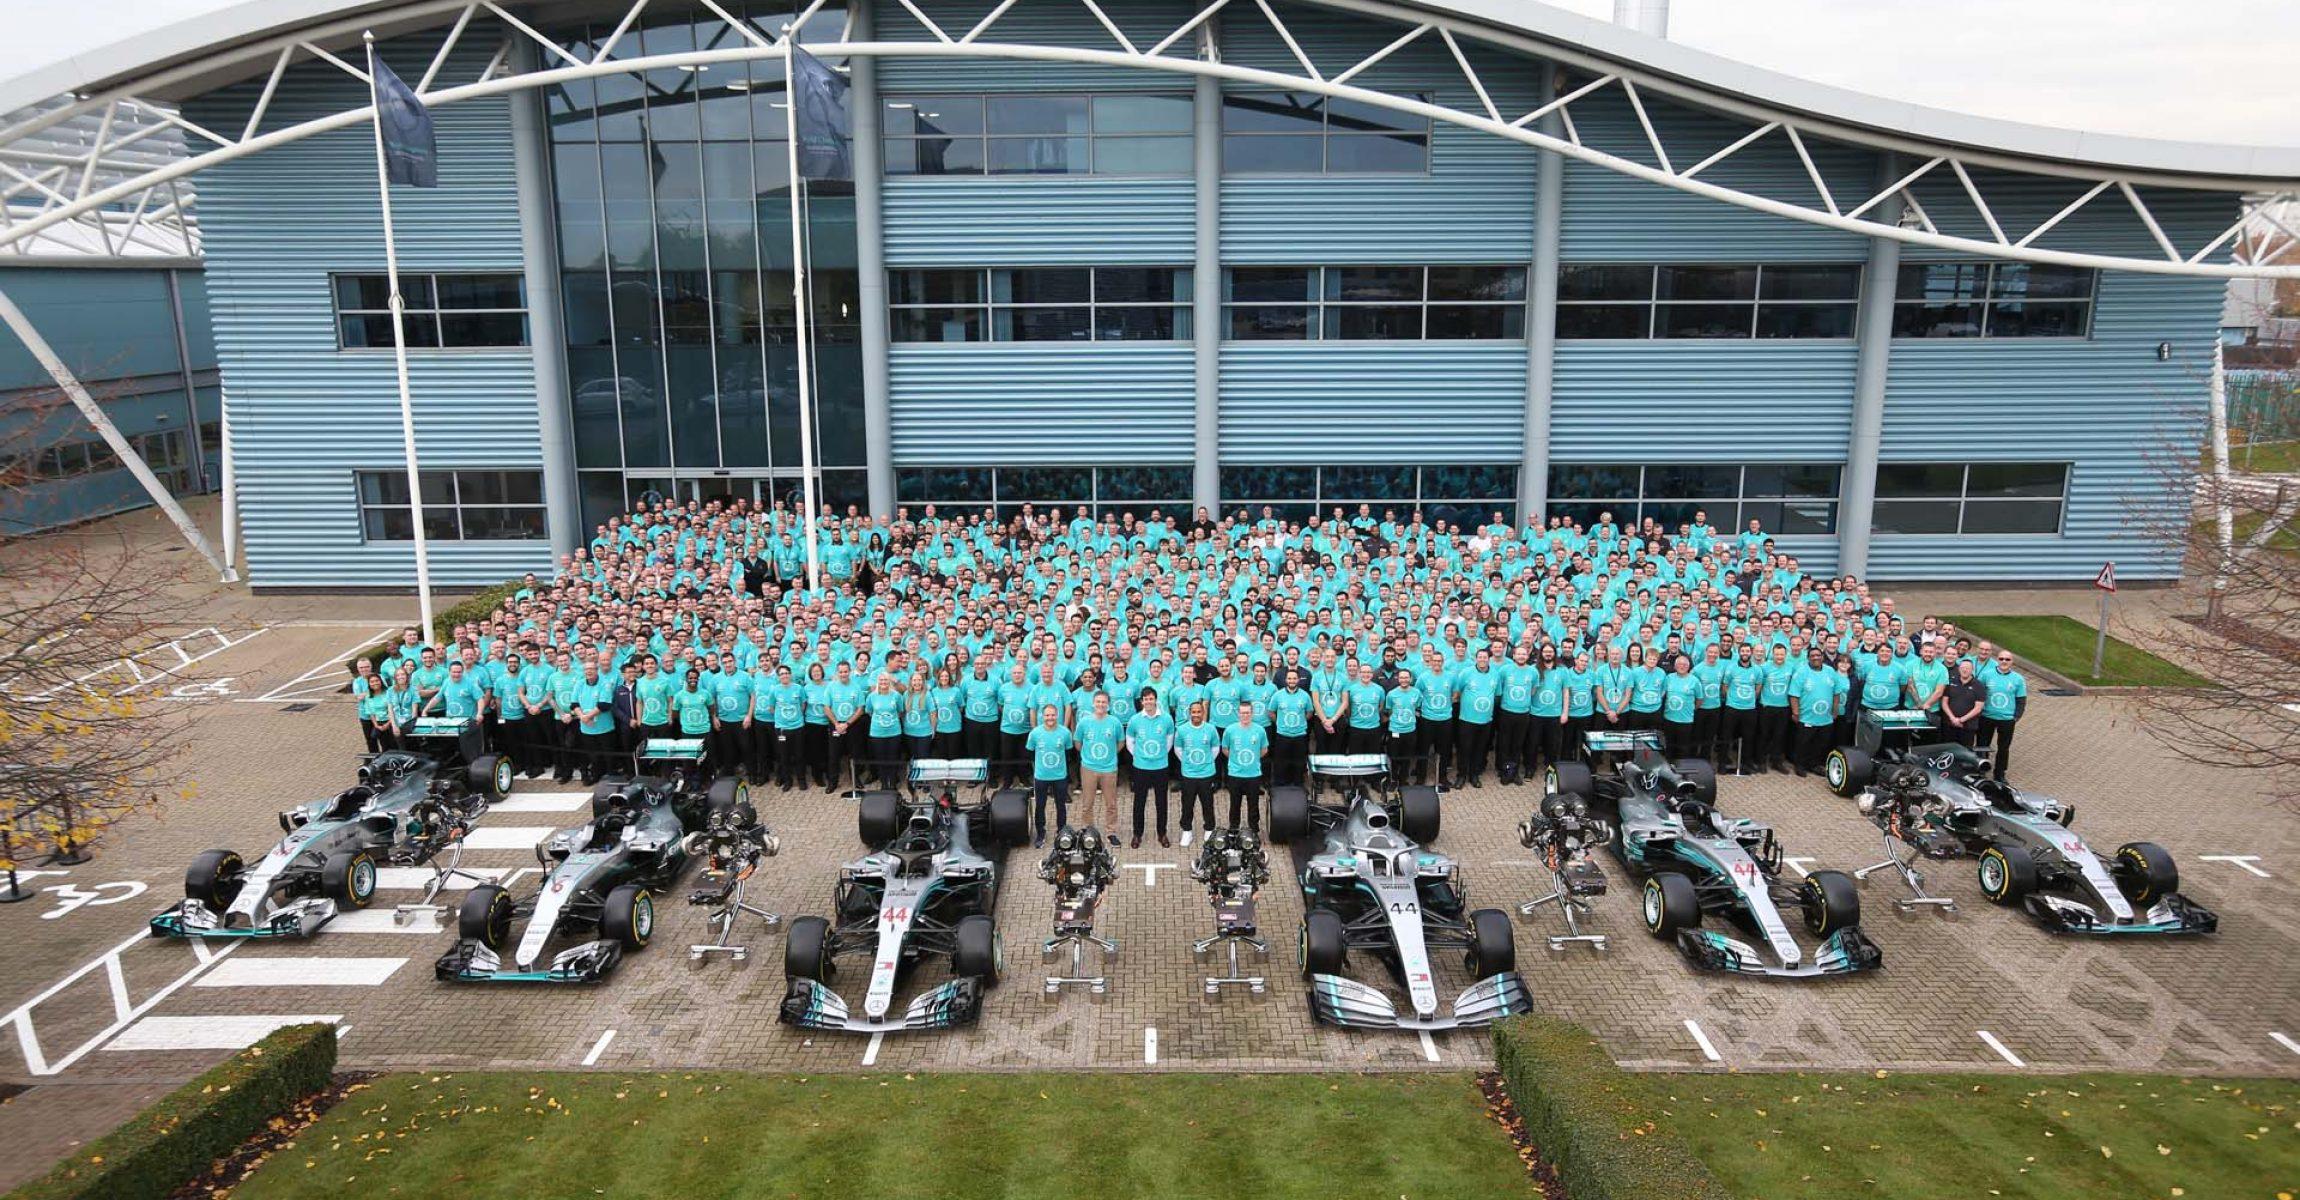 2019 Championship Celebrations - Brackley and Brixworth Mercedes team celebration